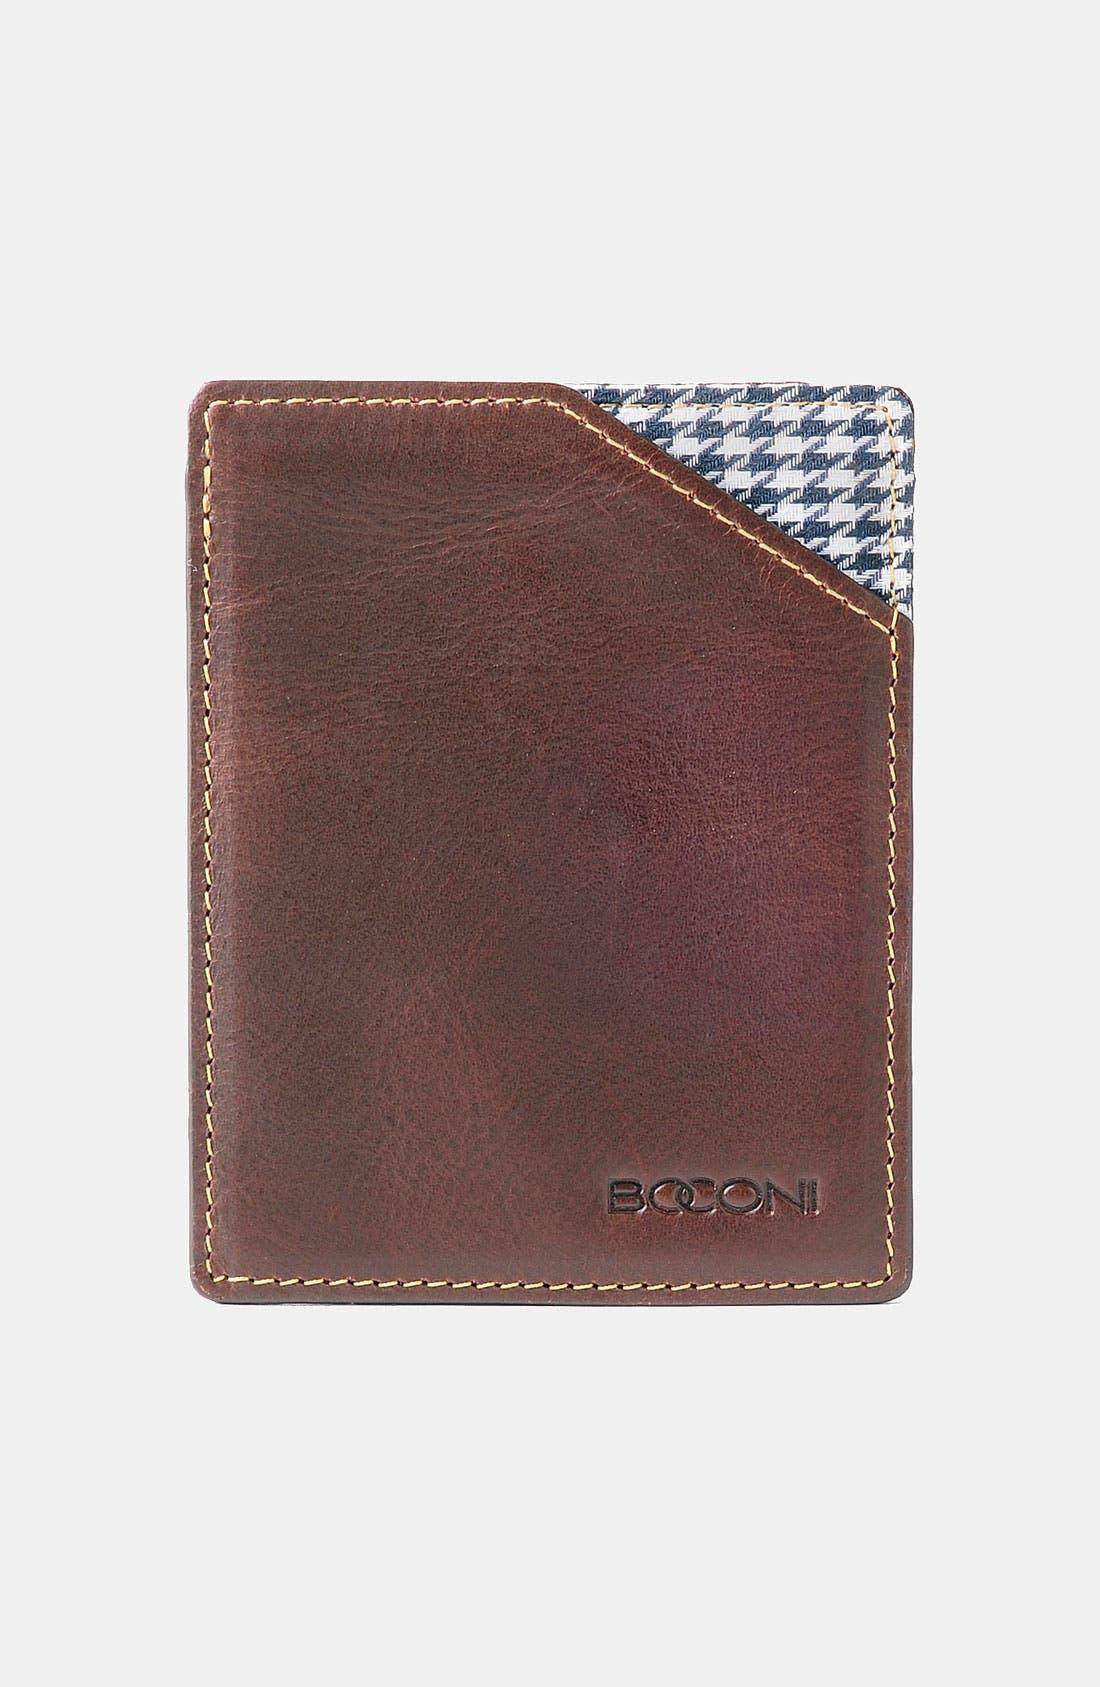 Alternate Image 1 Selected - Boconi 'Bryant' RFID Blocker Card Case